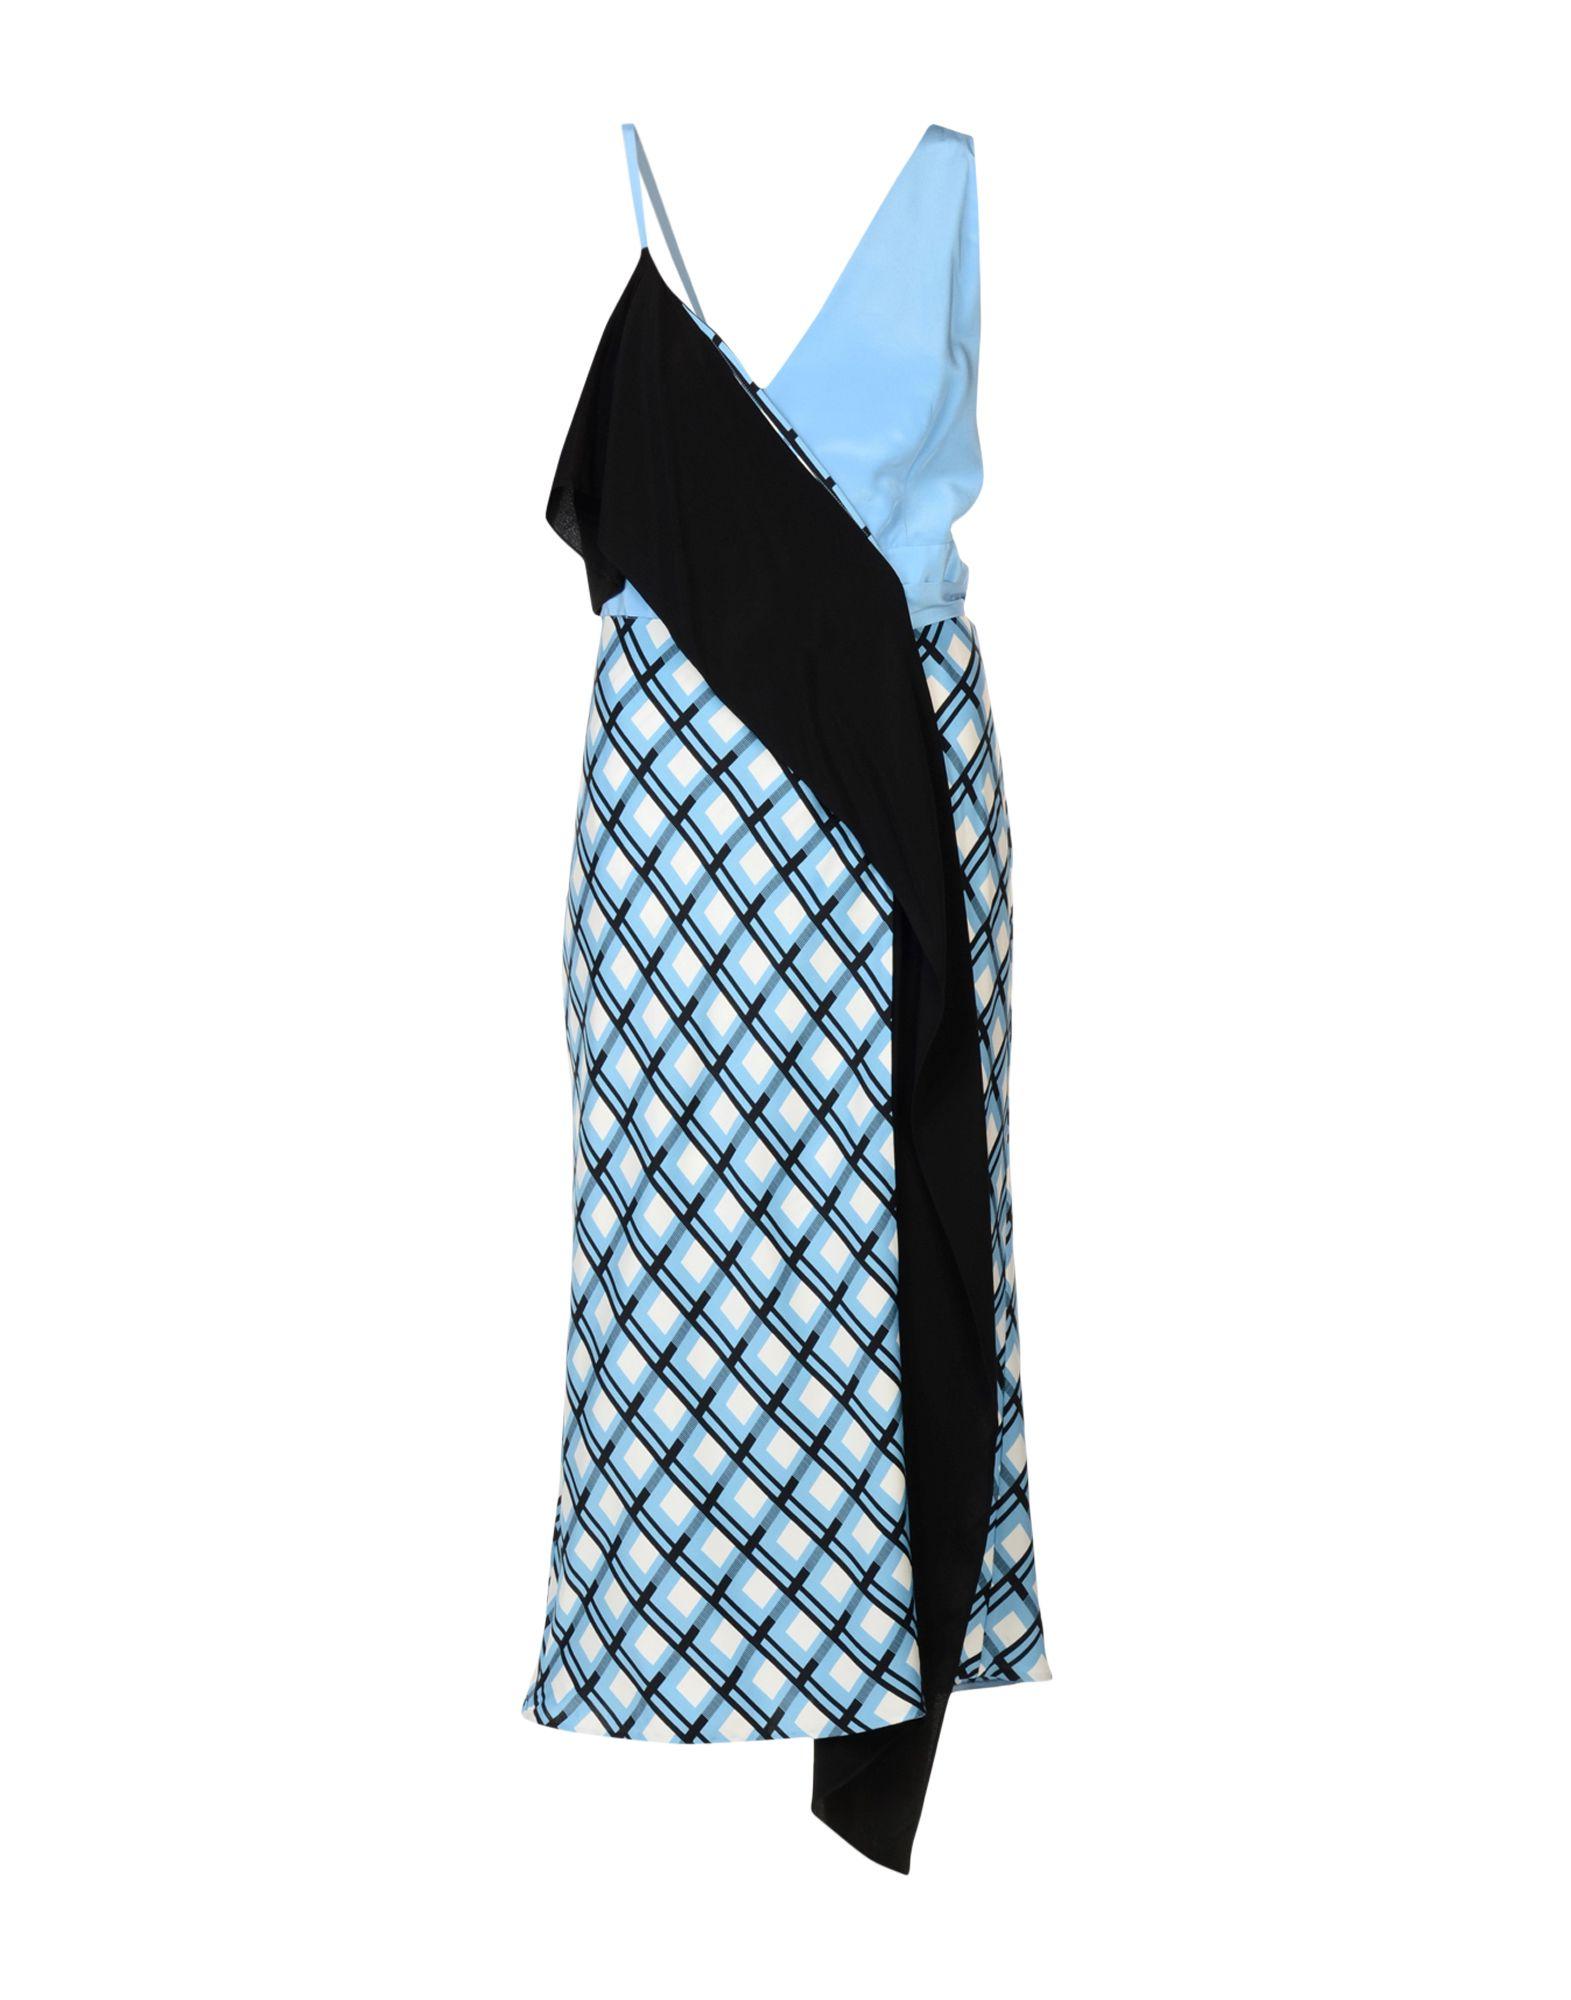 Vestito Cerimonia Diane Von Furstenberg Donna - Acquista online su TvN8OkzLQl